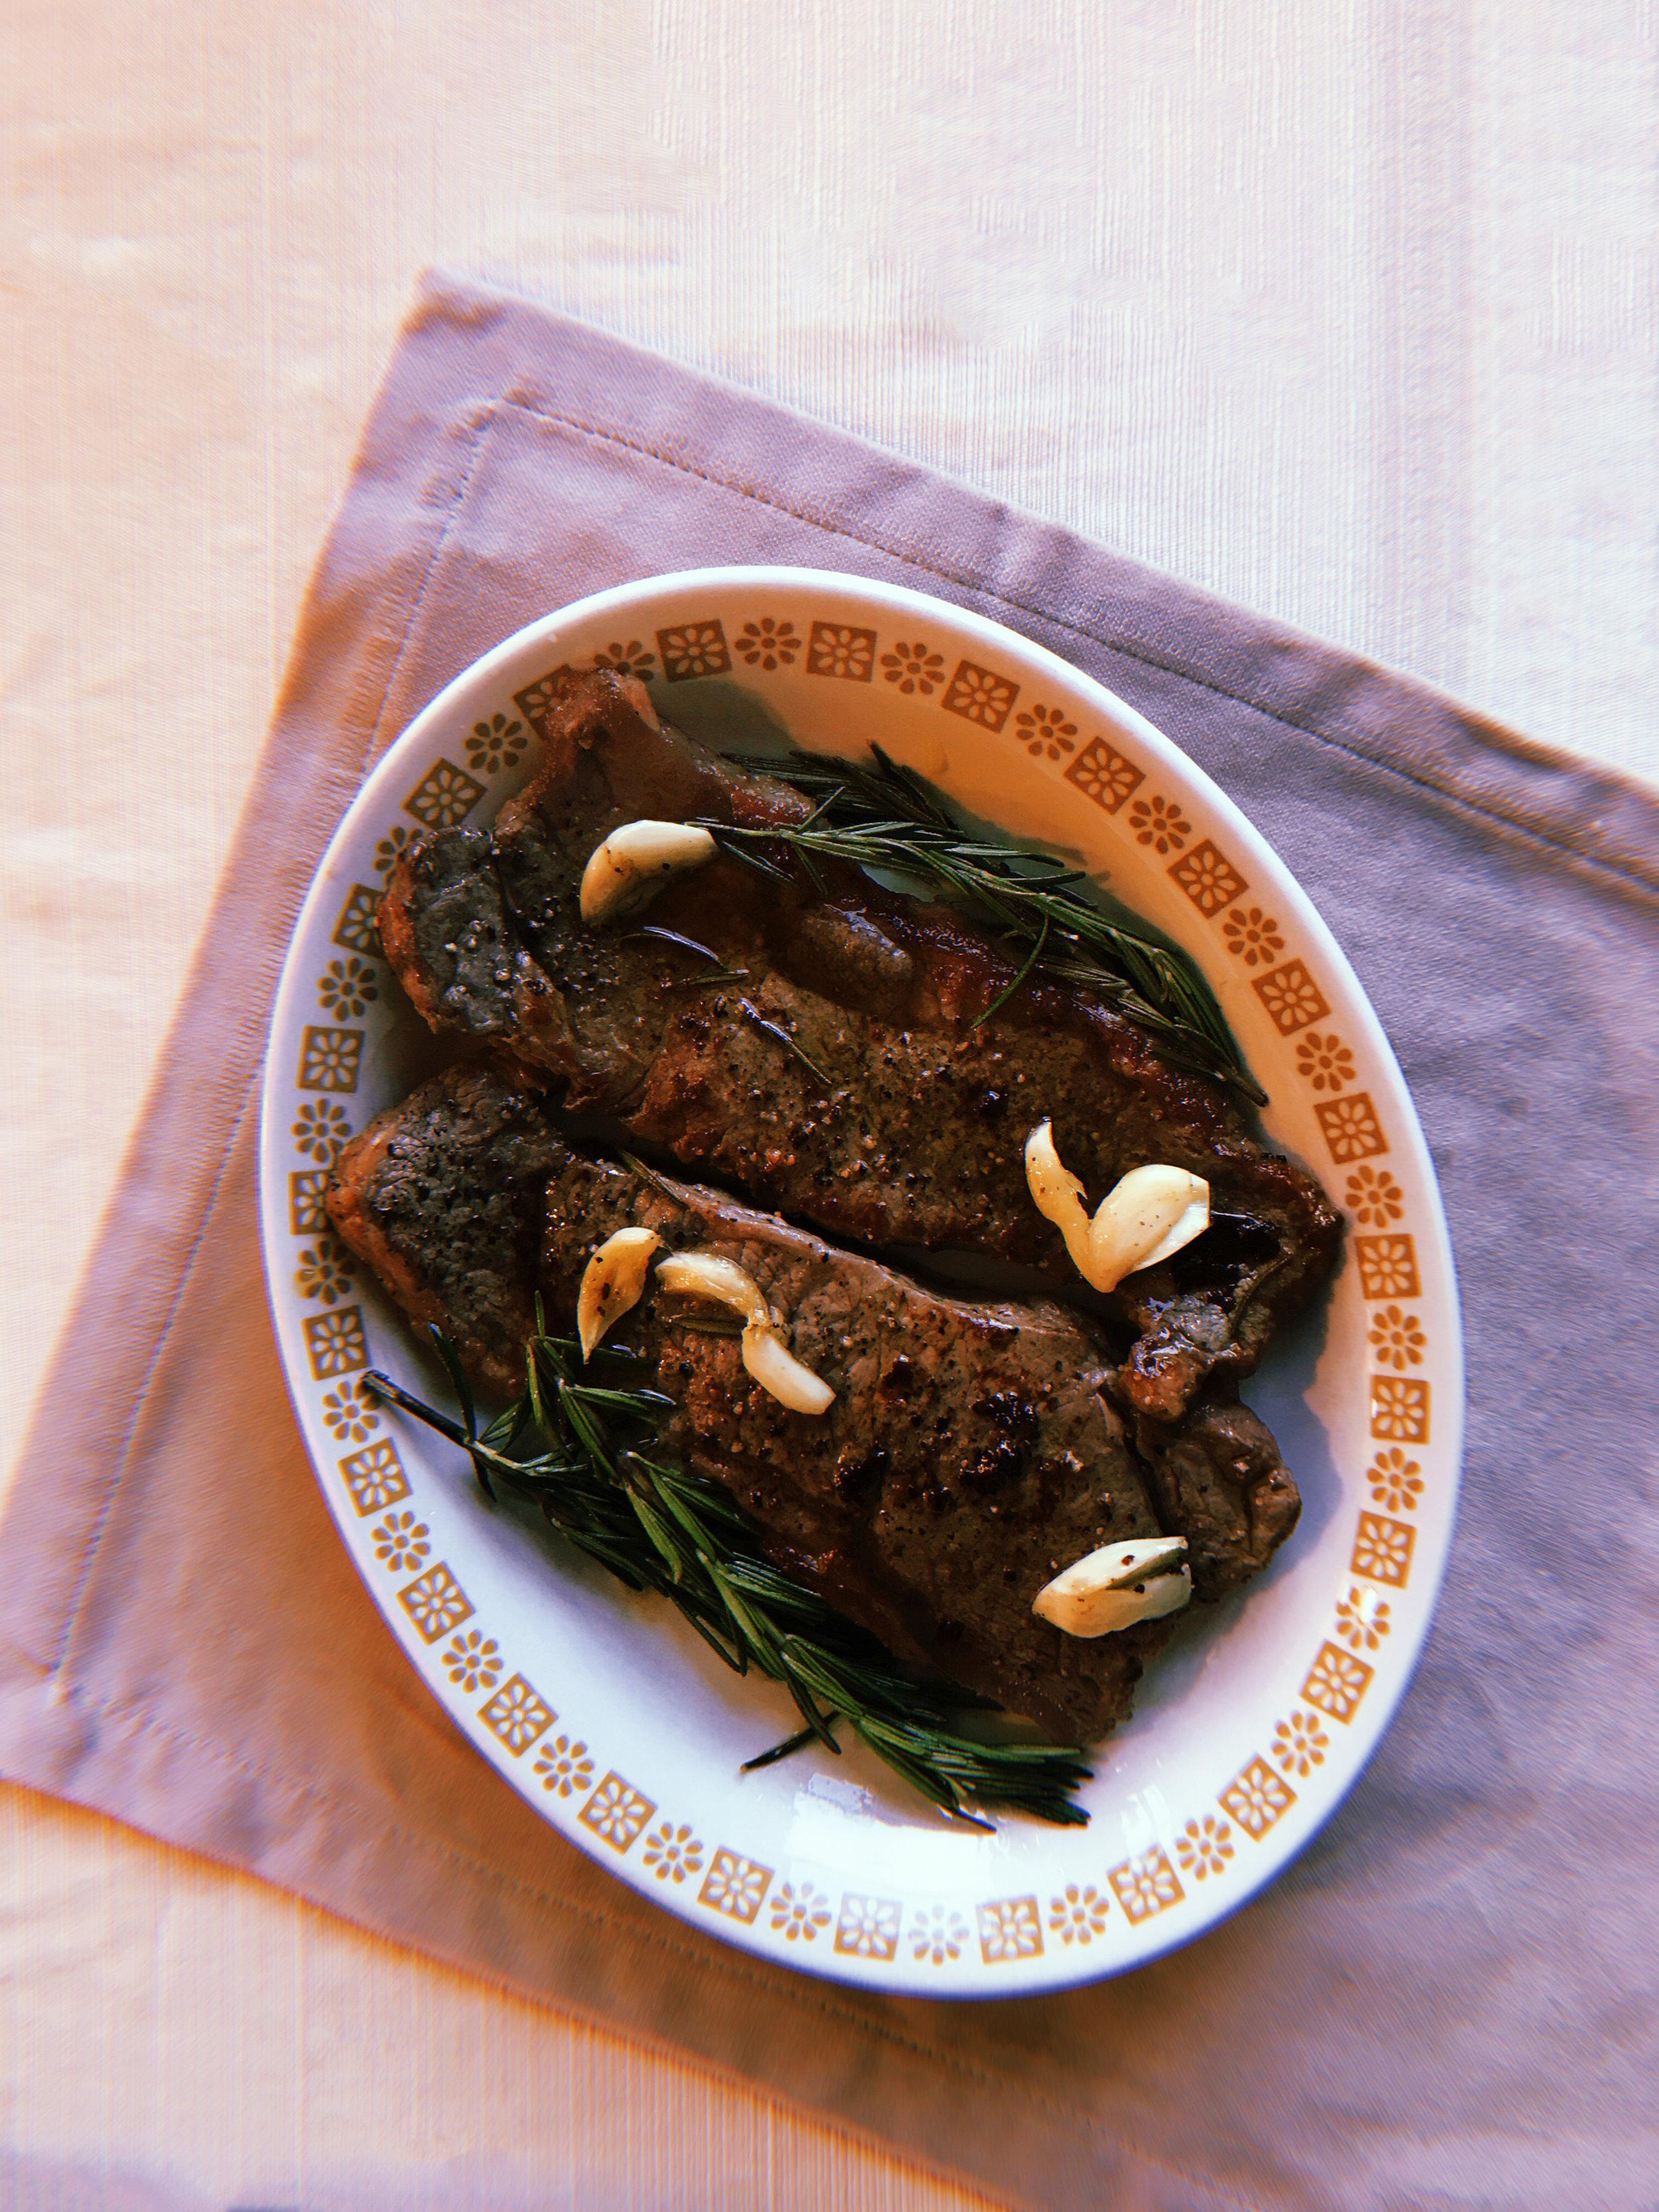 - Steak with Rosemary aglio olio